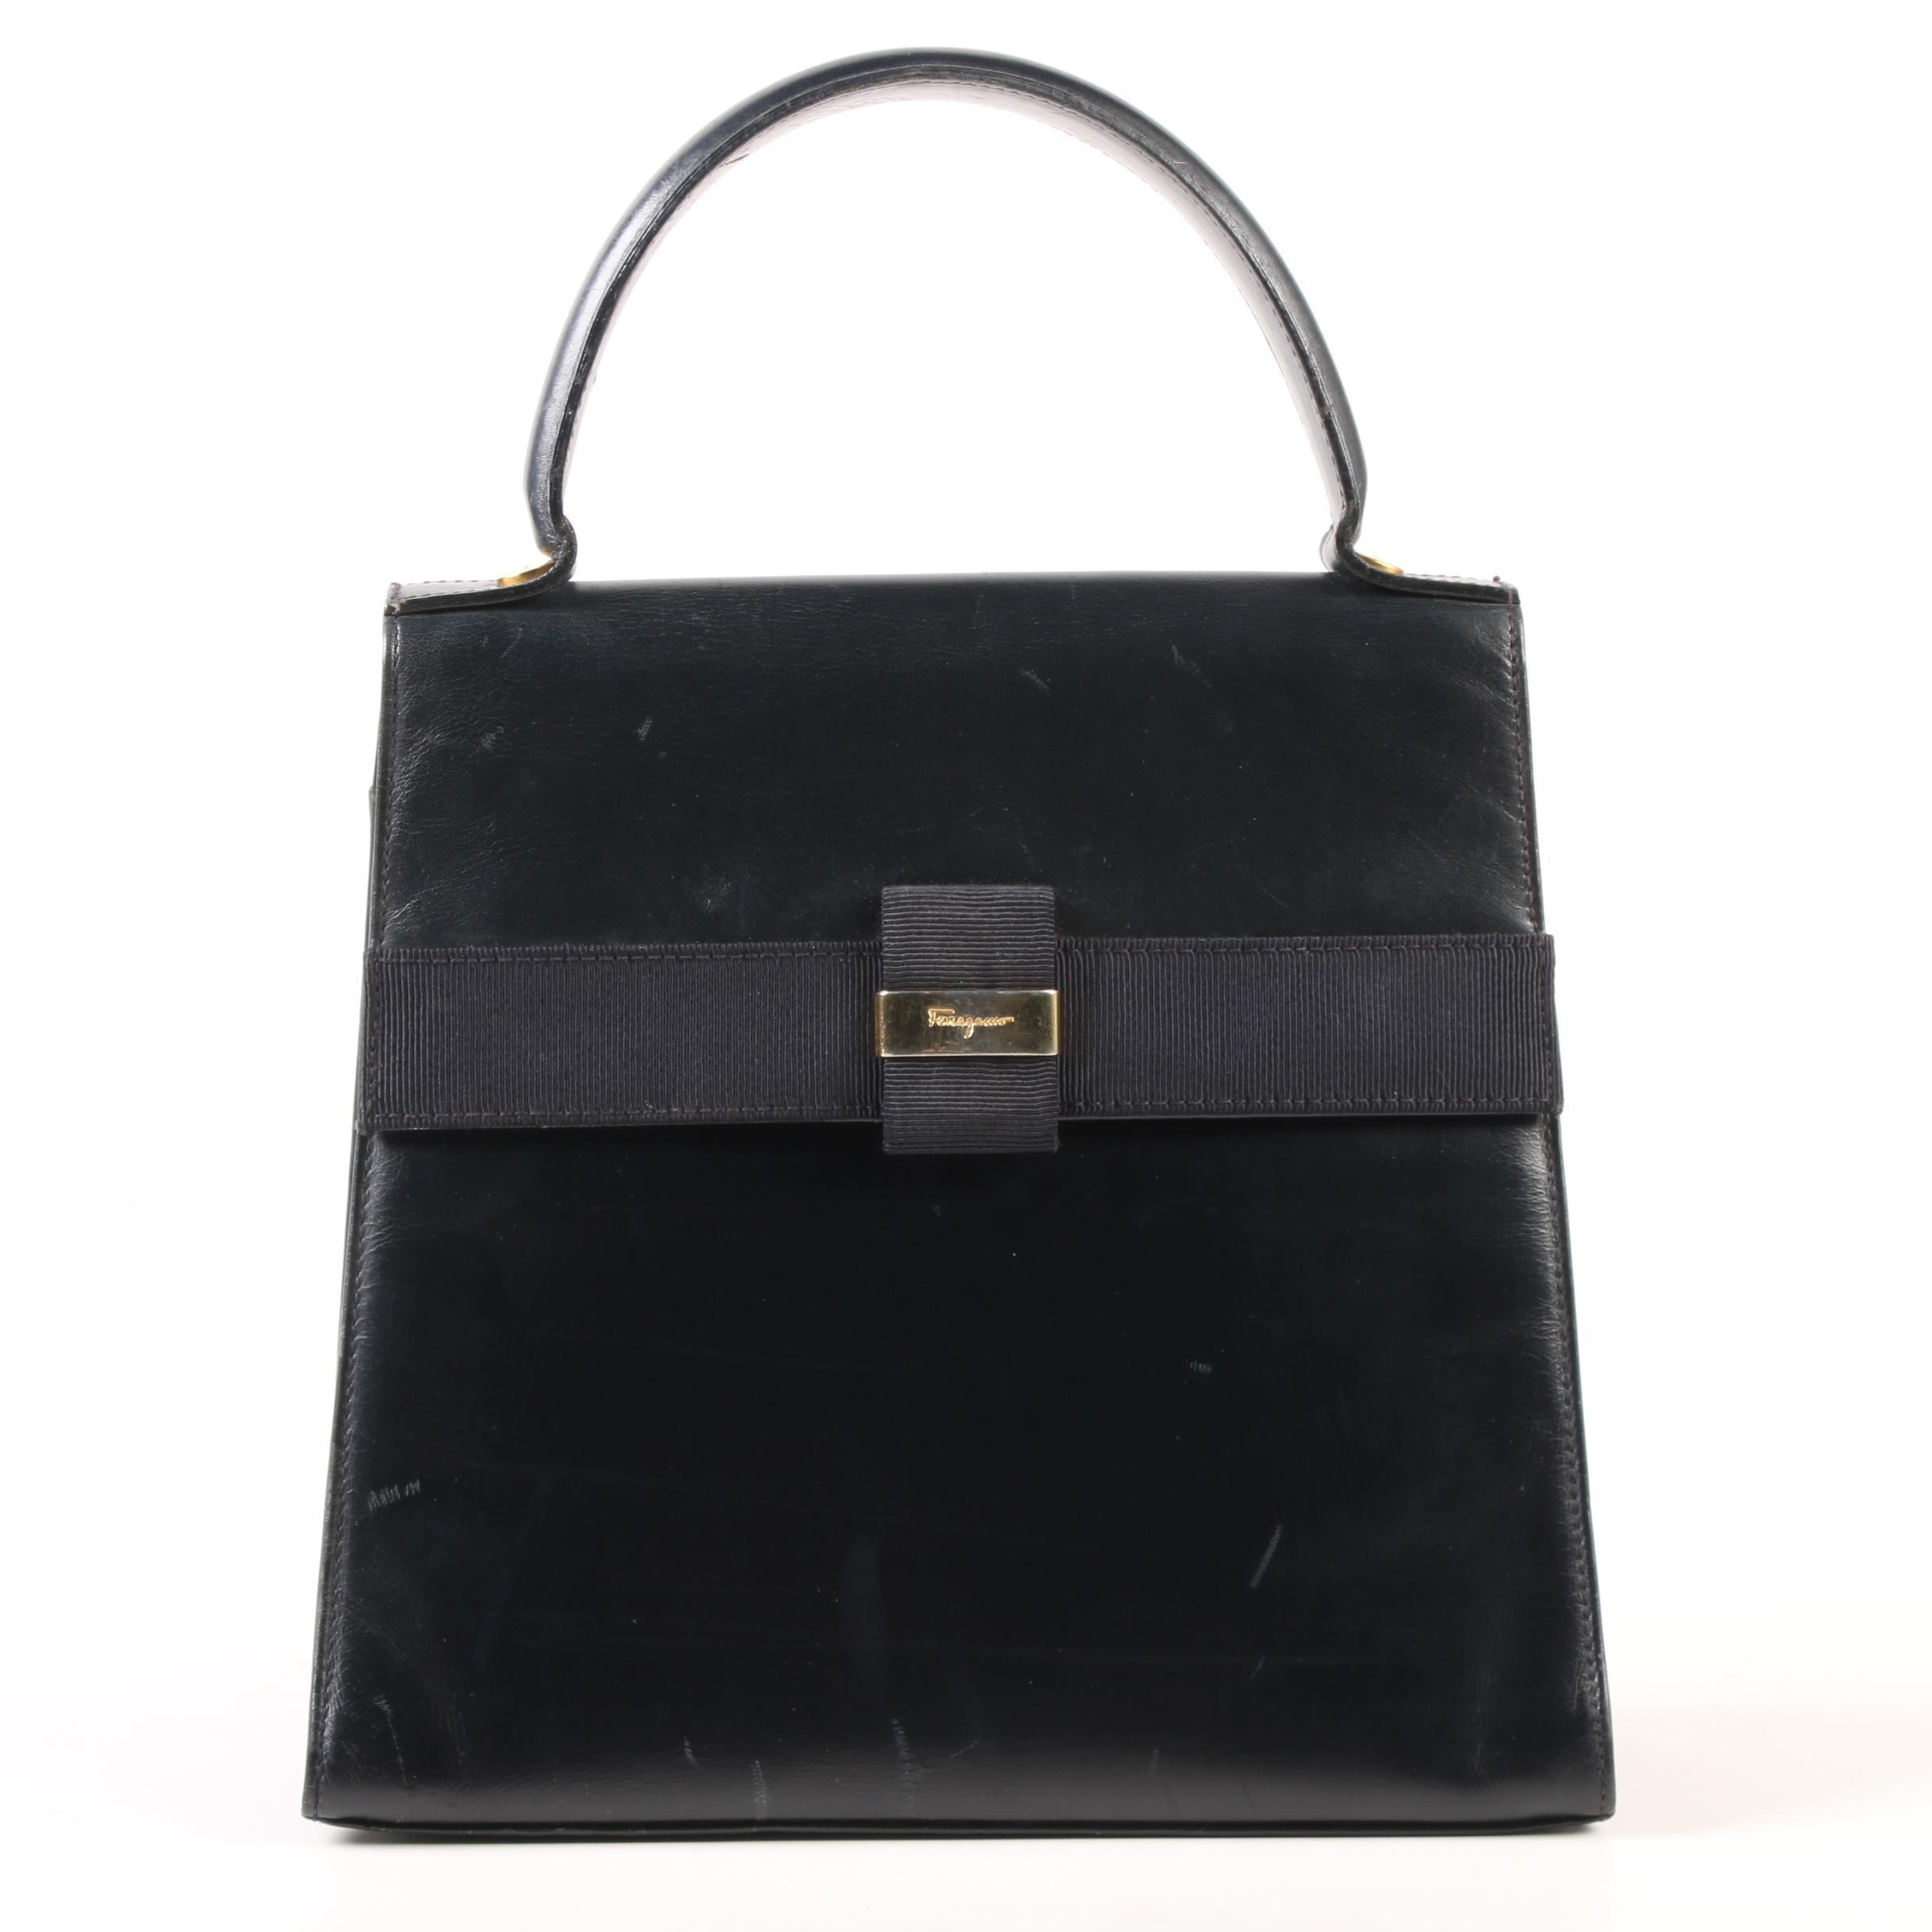 Salvatore Ferragamo Deep Midnight Blue Leather Vera Bow Bag, Vintage